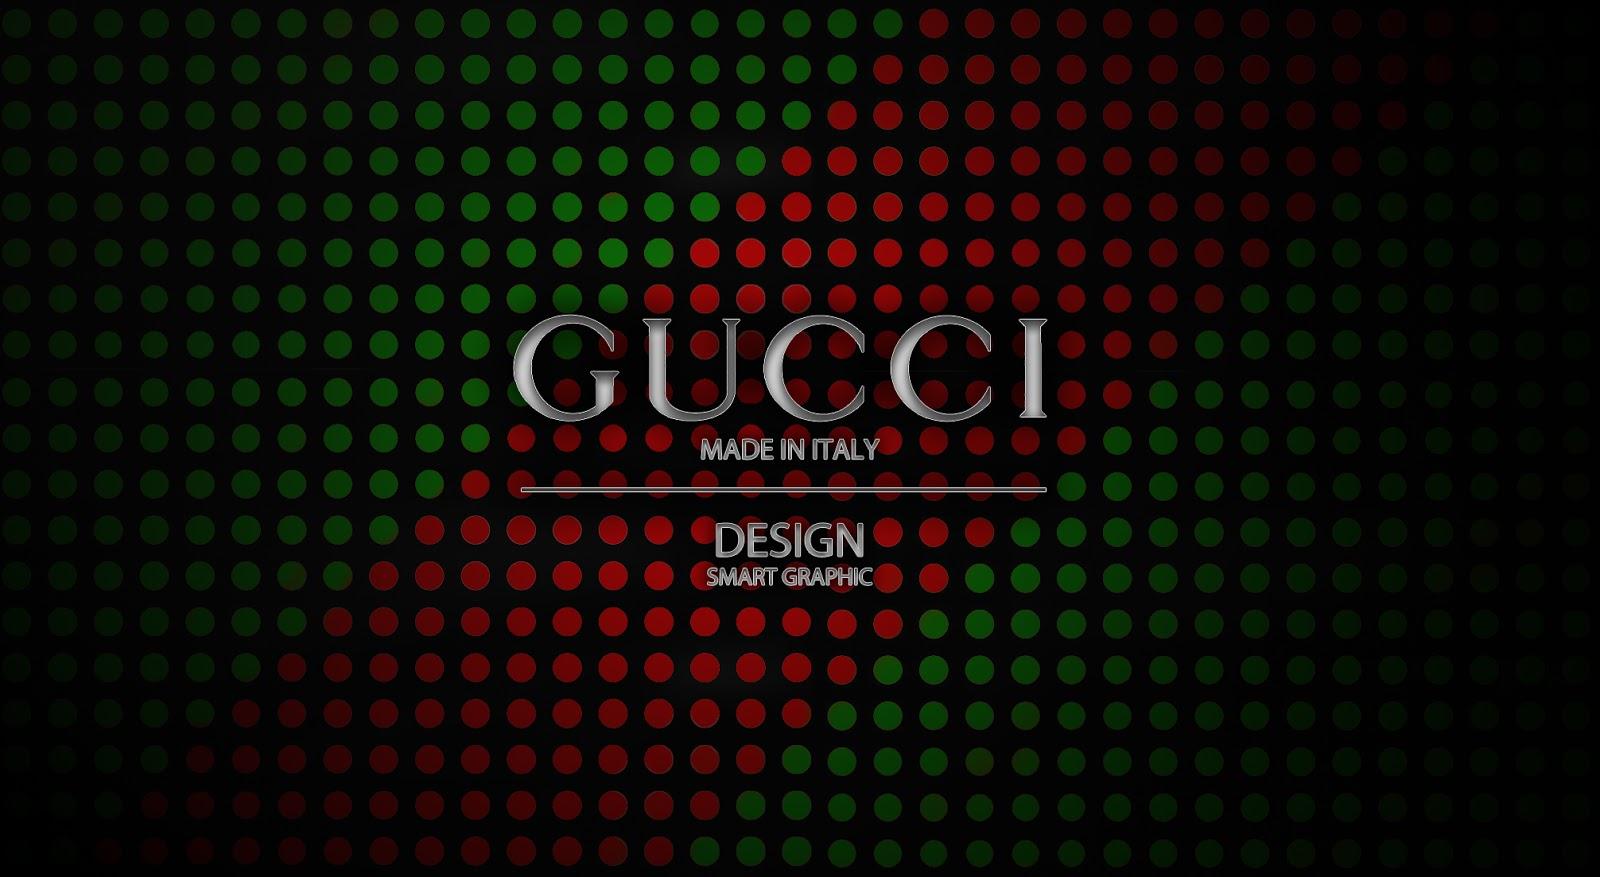 Gucci Wallpaper Hd Gucci   wallpaper 1600x877